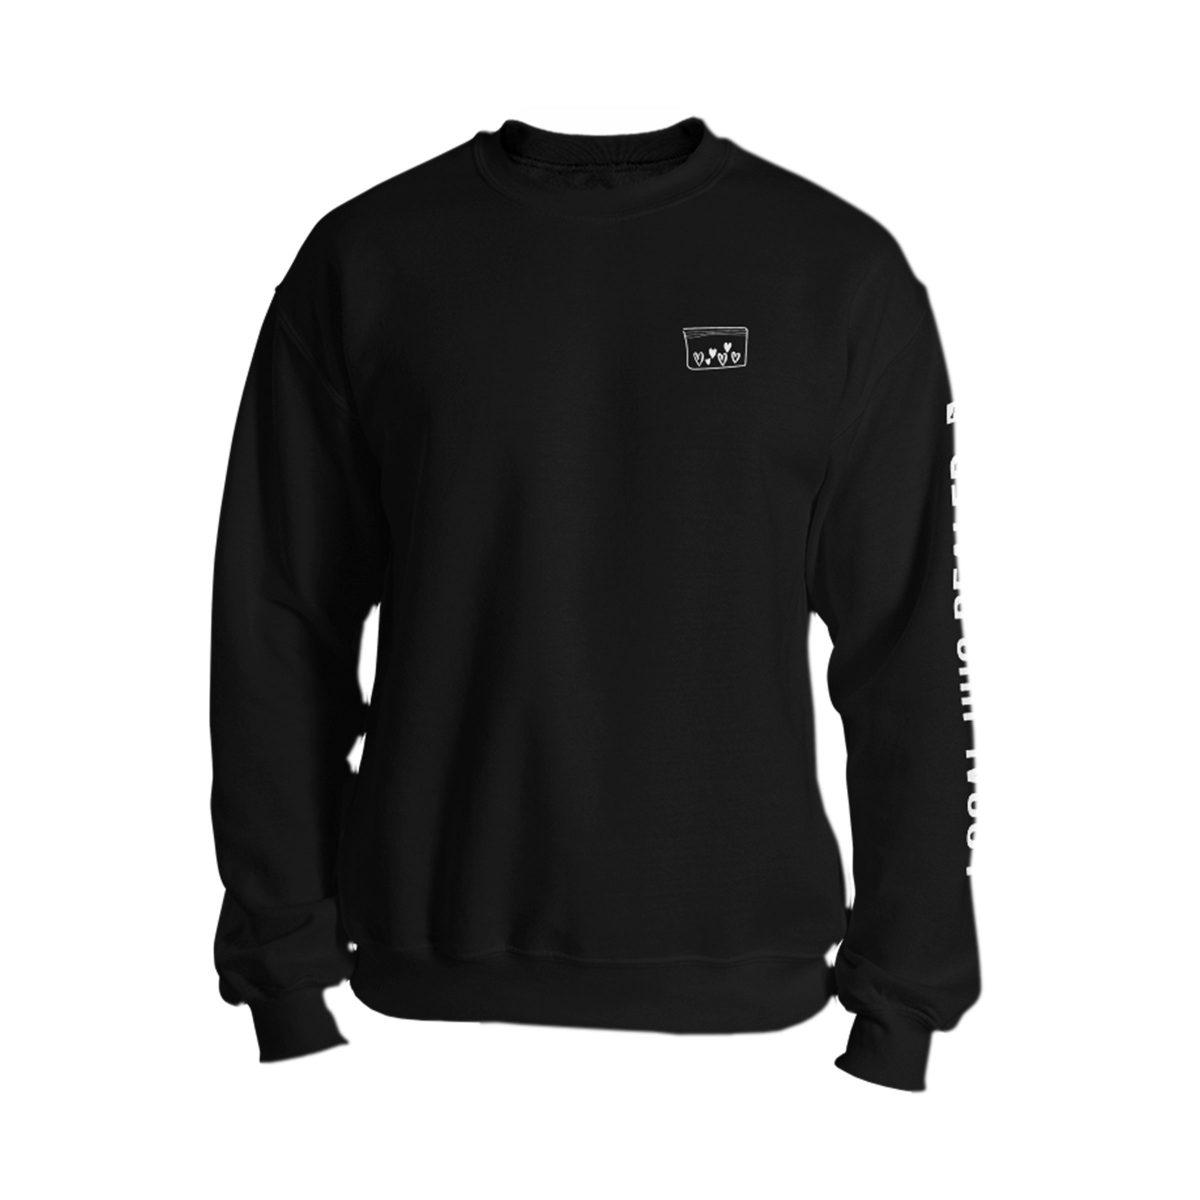 LOCAL HUG DEALER sweatshirt in black by kikicutt sweatshirt store